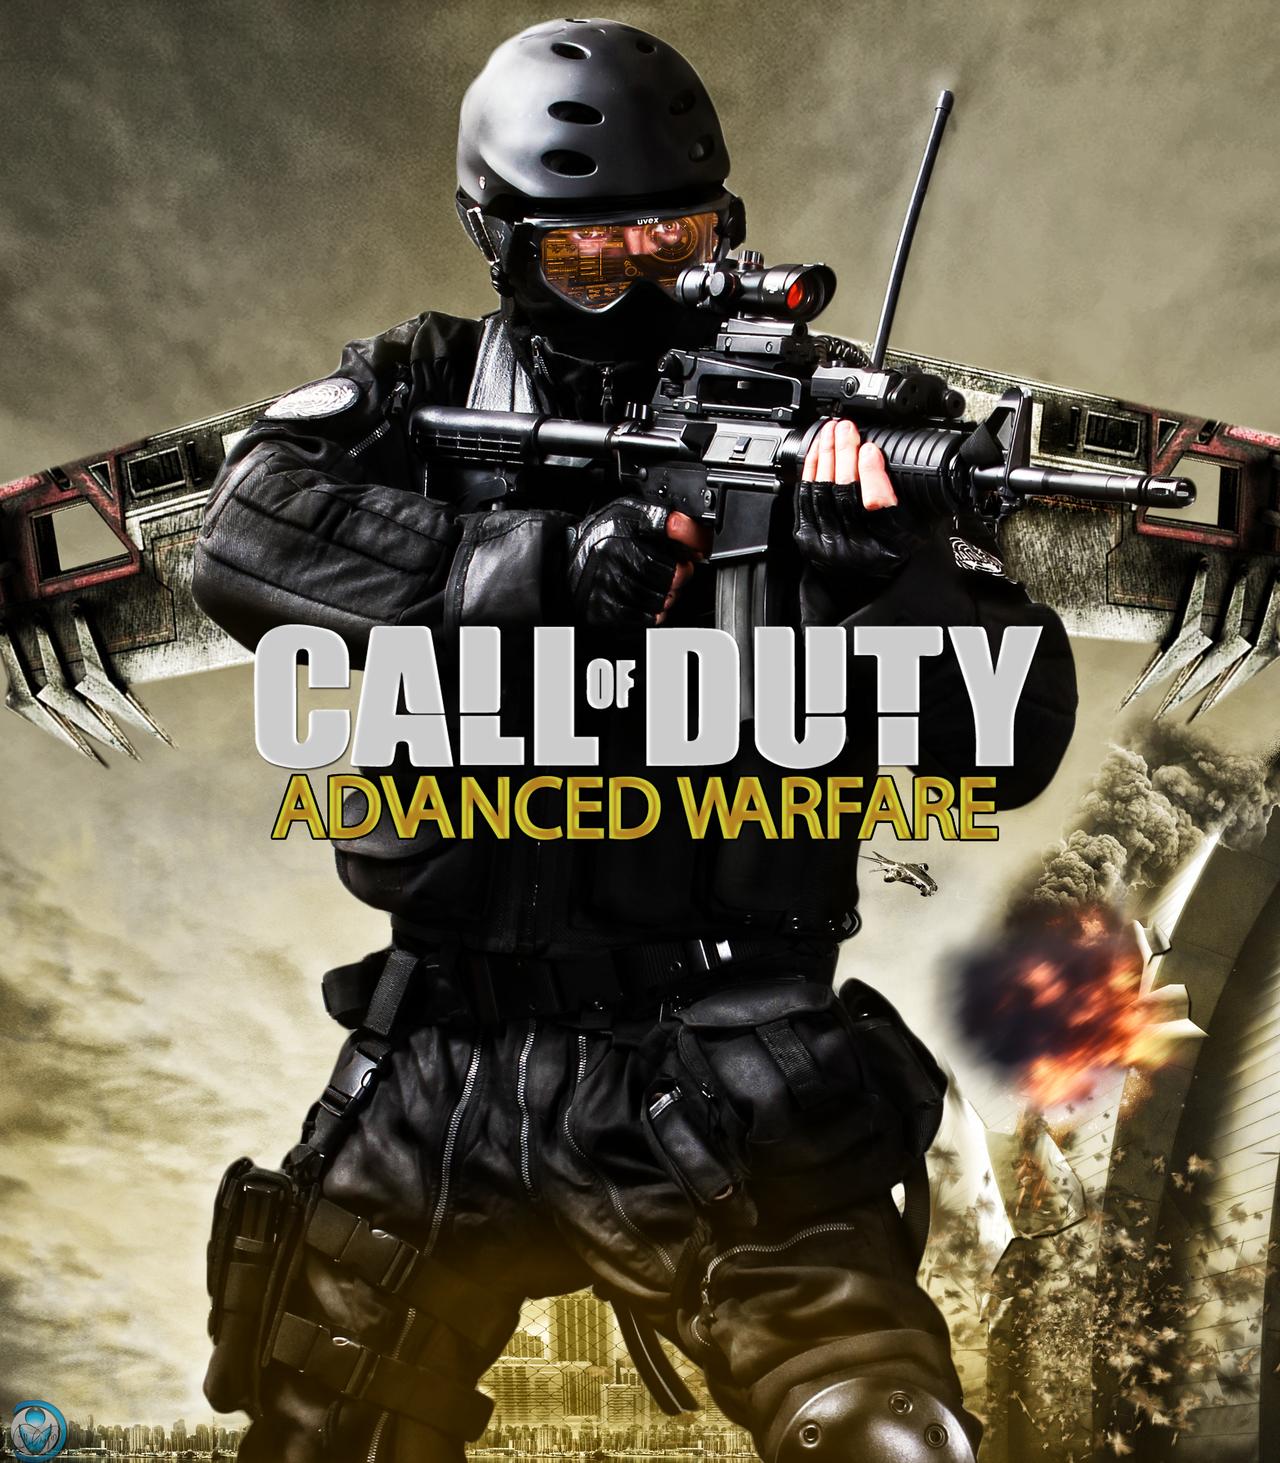 Call Of Duty Advanced Warfare By Mrchapindesigns On Deviantart Call Of Duty Advanced Warfare Call Of Duty Aw